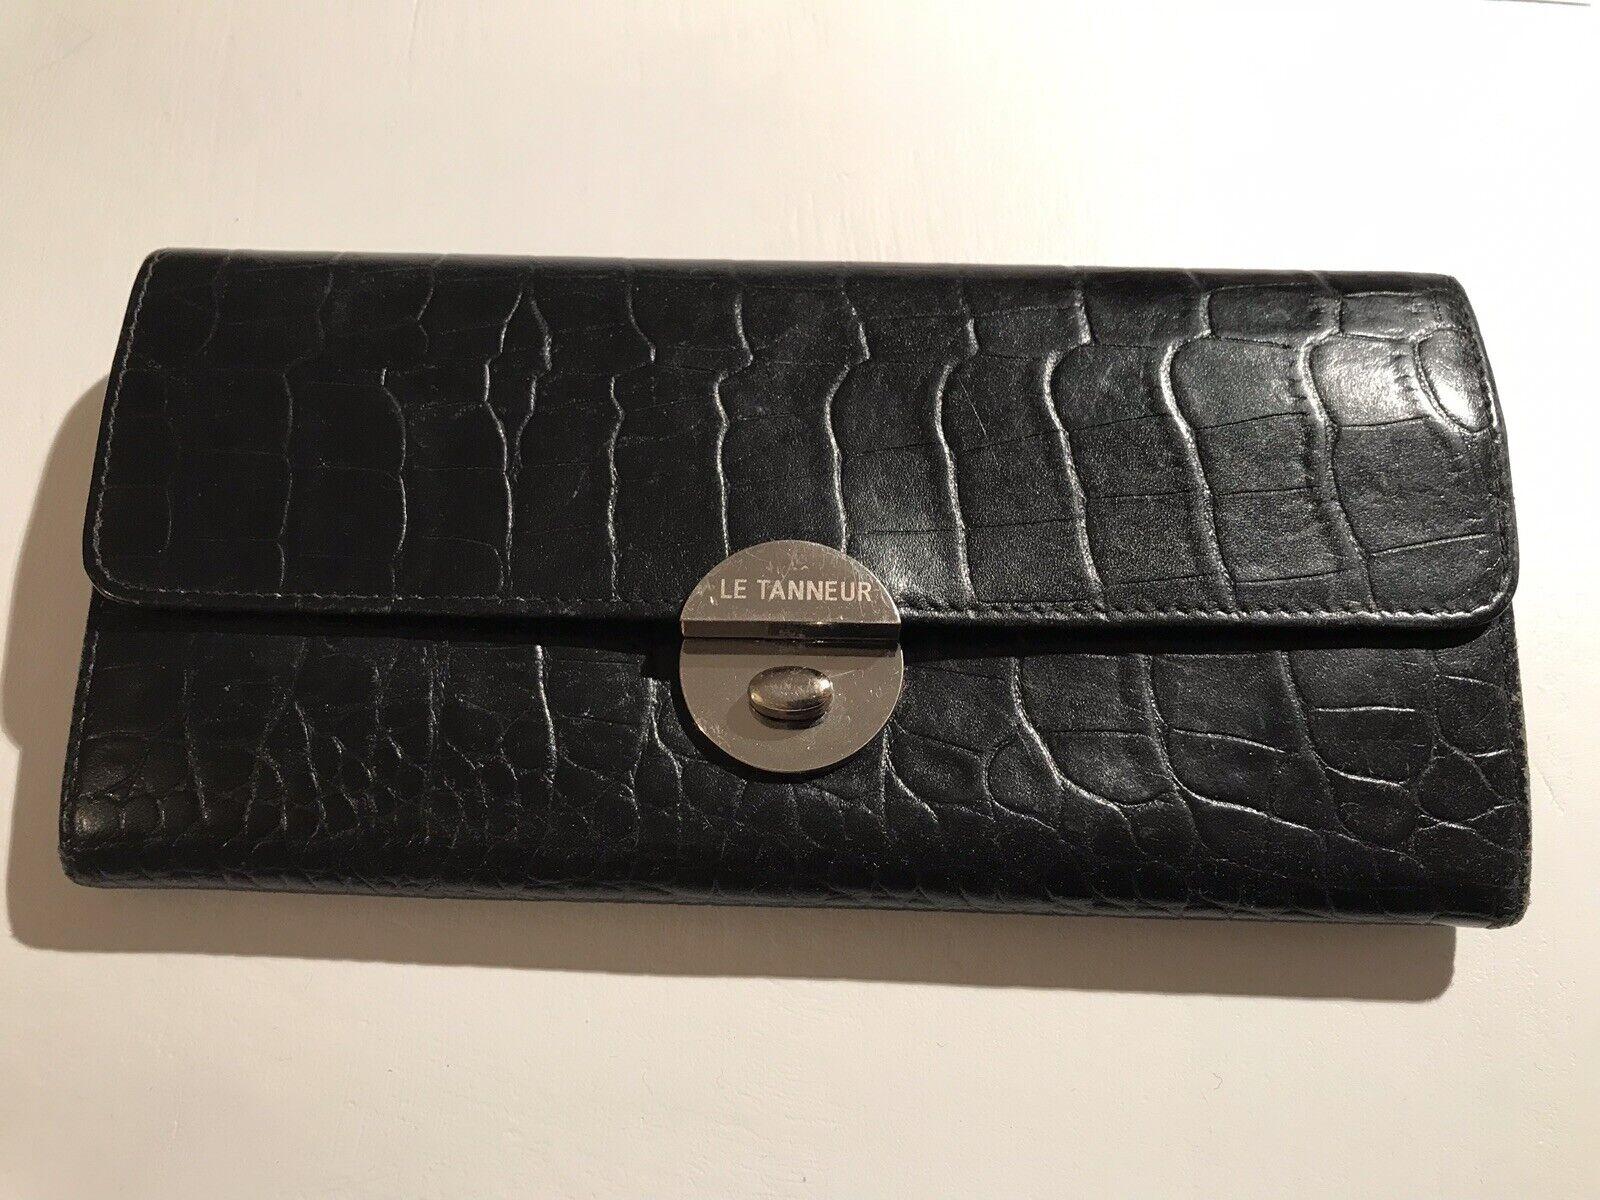 Le Tanneur - Luxury Purse Black - Women's wallet - in good conditions